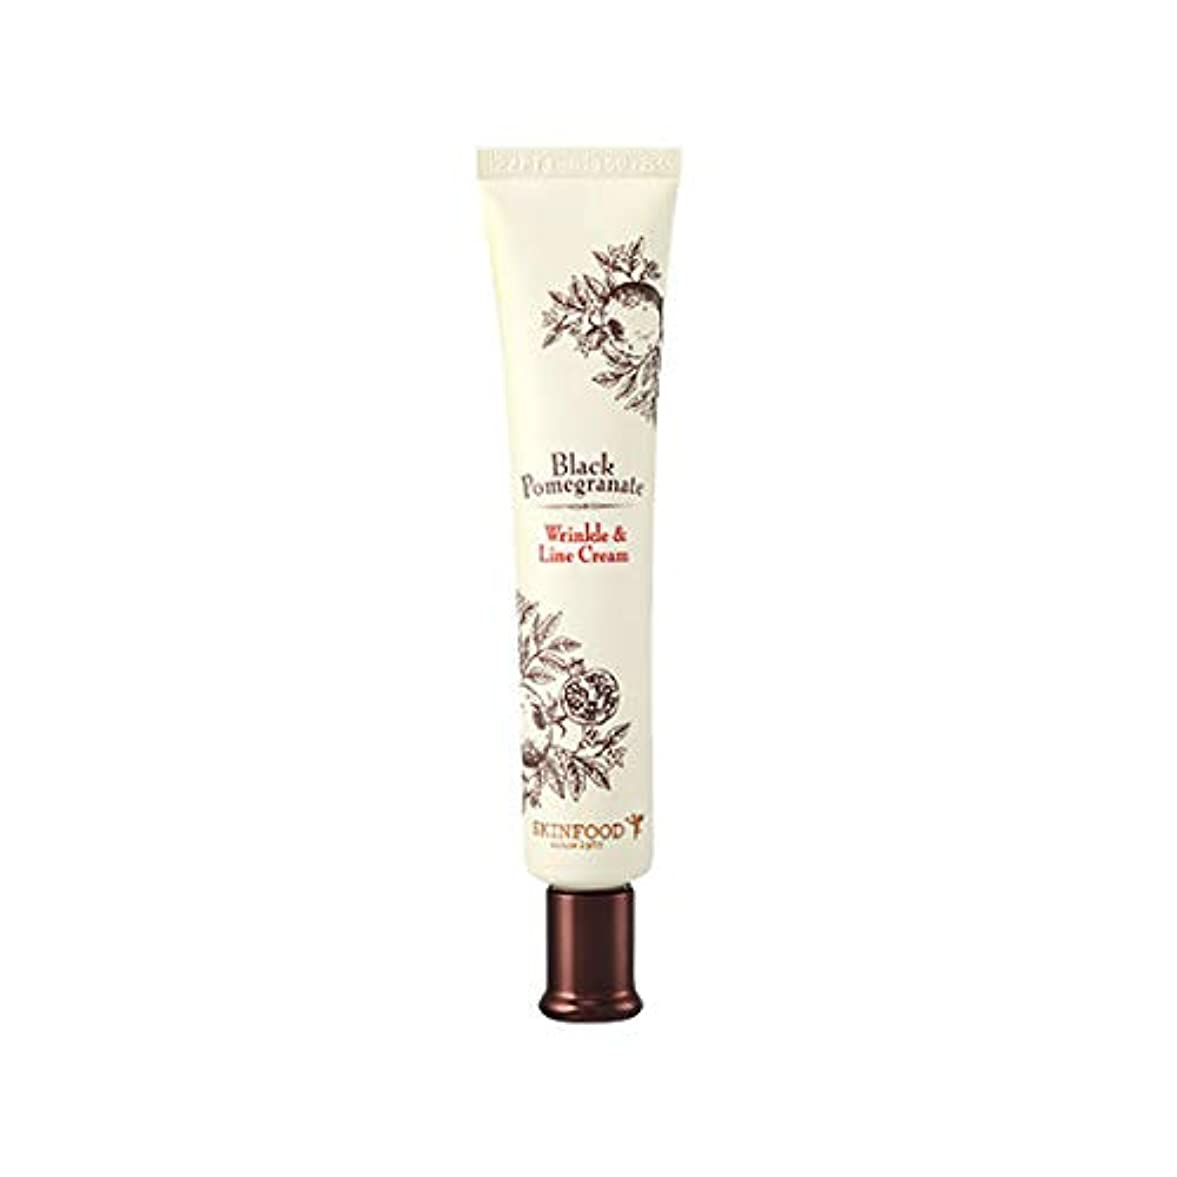 Skinfood 黒ザクロシワ&ラインクリーム(シワ防止効果) / Black Pomegranate Wrinkle & Line Cream (Anti-Wrinkle Effect) 30ml [並行輸入品]